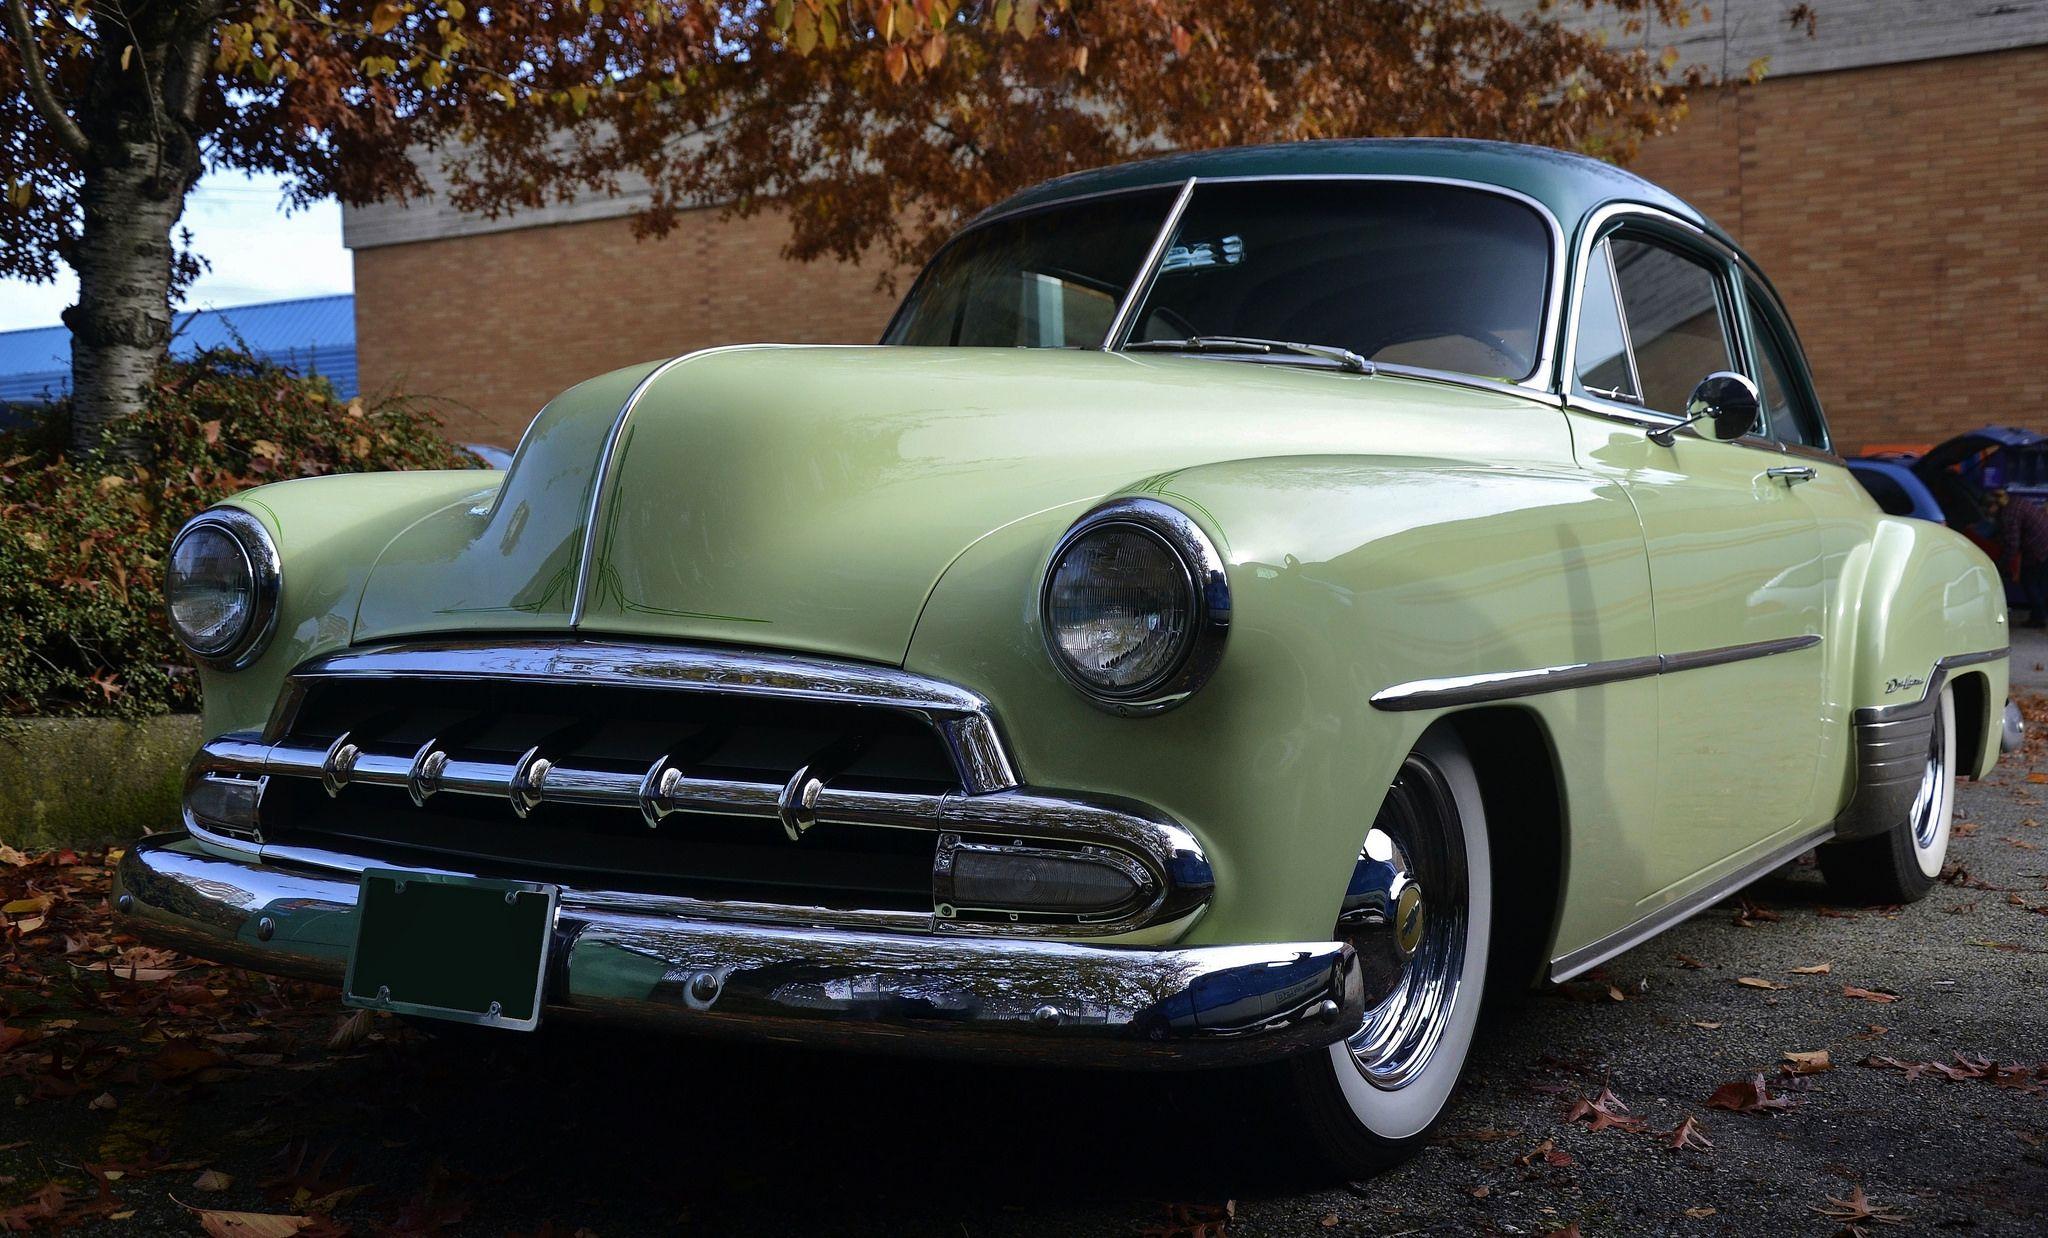 1952 Chevrolet Styleline Deluxe Sport Coupe Chevrolet Sports